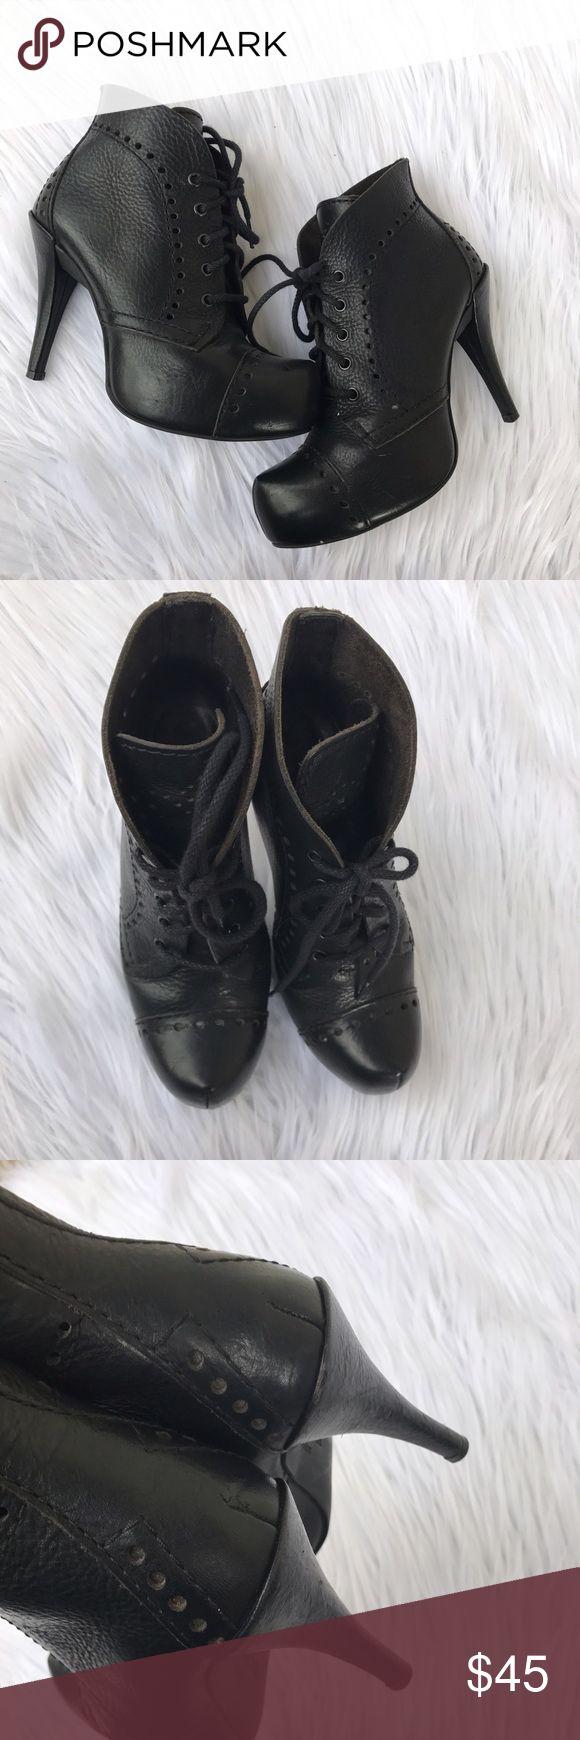 PEDRO GARCIA SZ 8 BOOTIES LEATHER SHOES HEELS CUTE Cute heels by Pedro Garcia Pedro Garcia Shoes